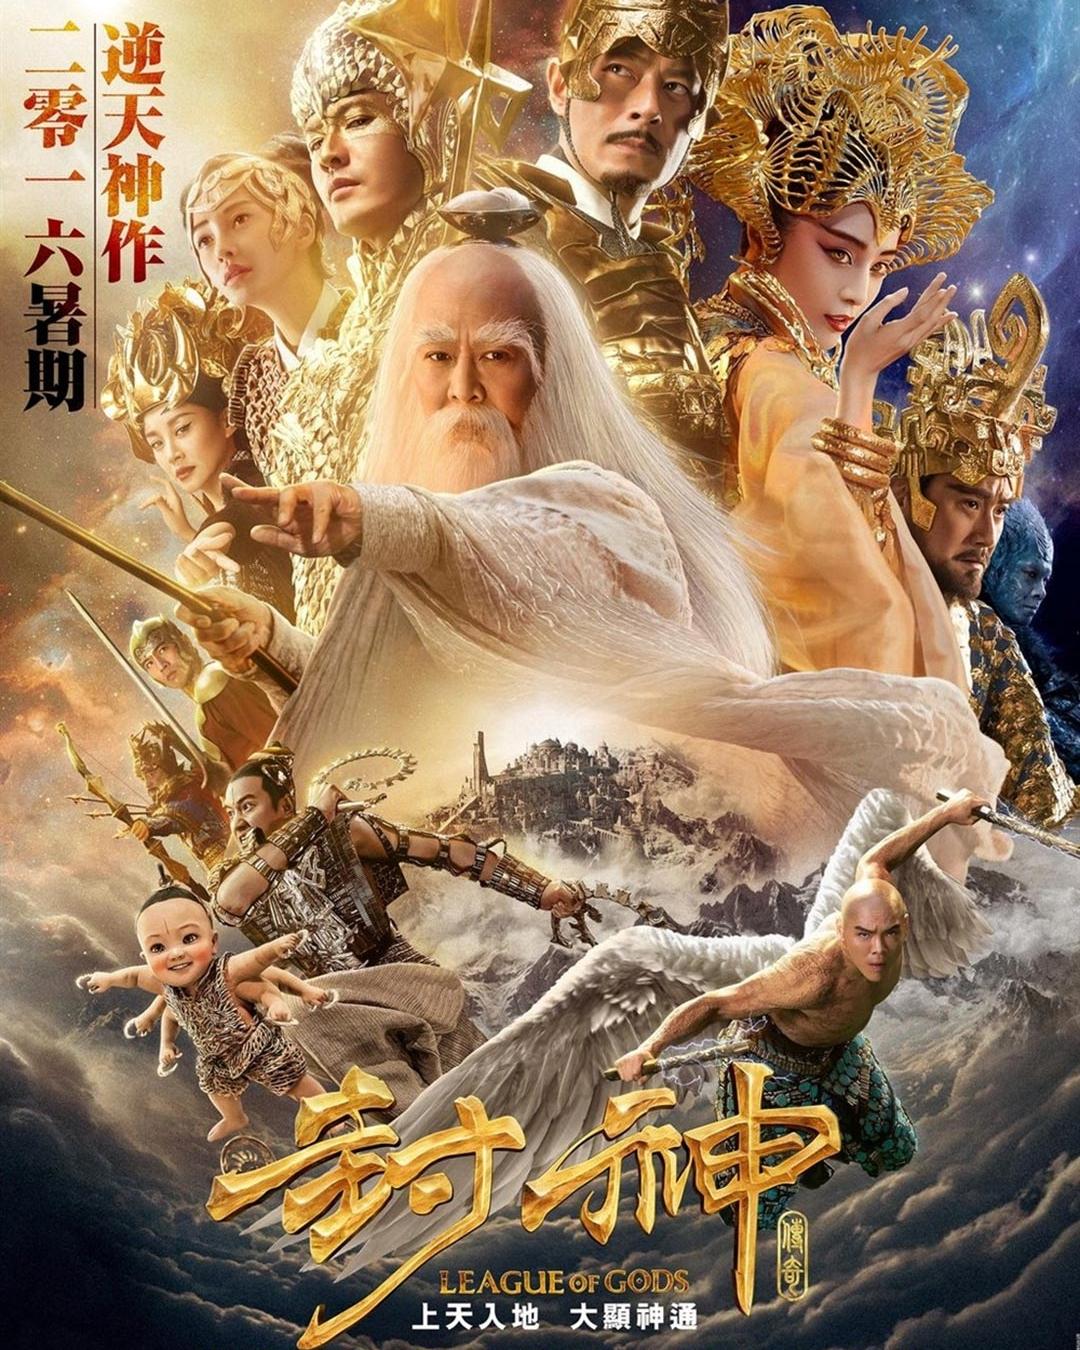 league-of-gods-poster.jpg